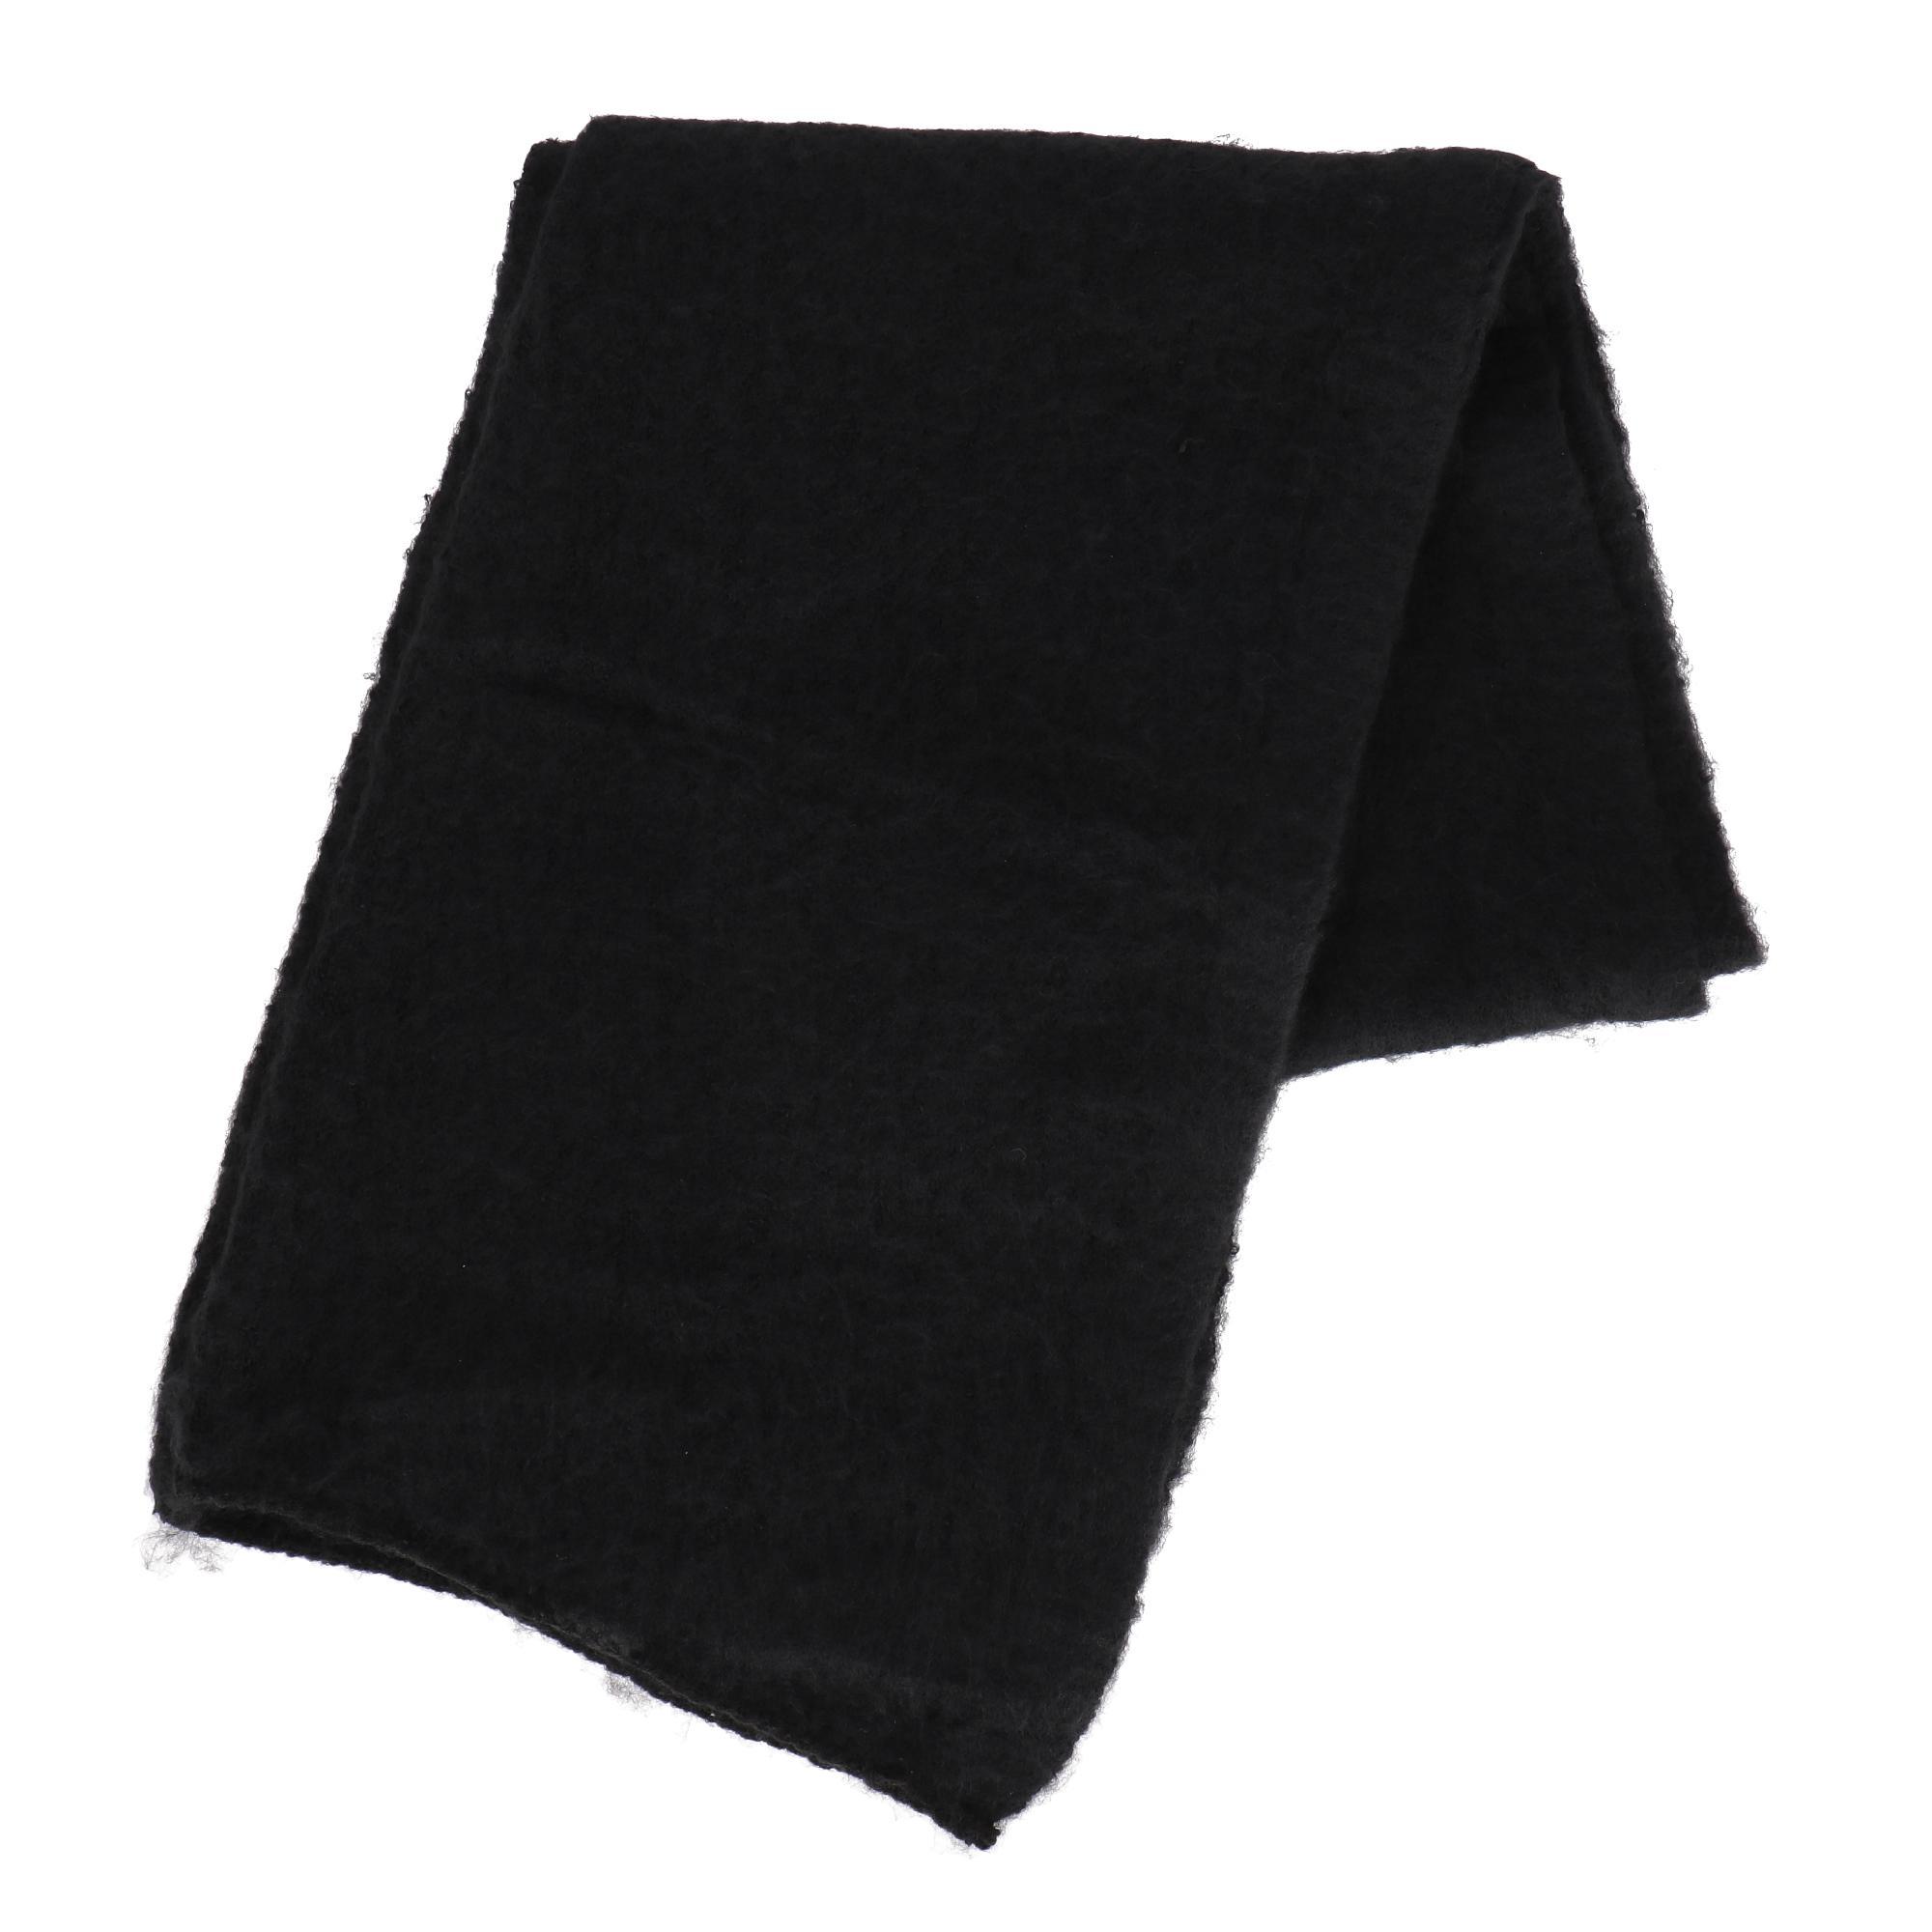 Only Lima Knit Long Scarf Black